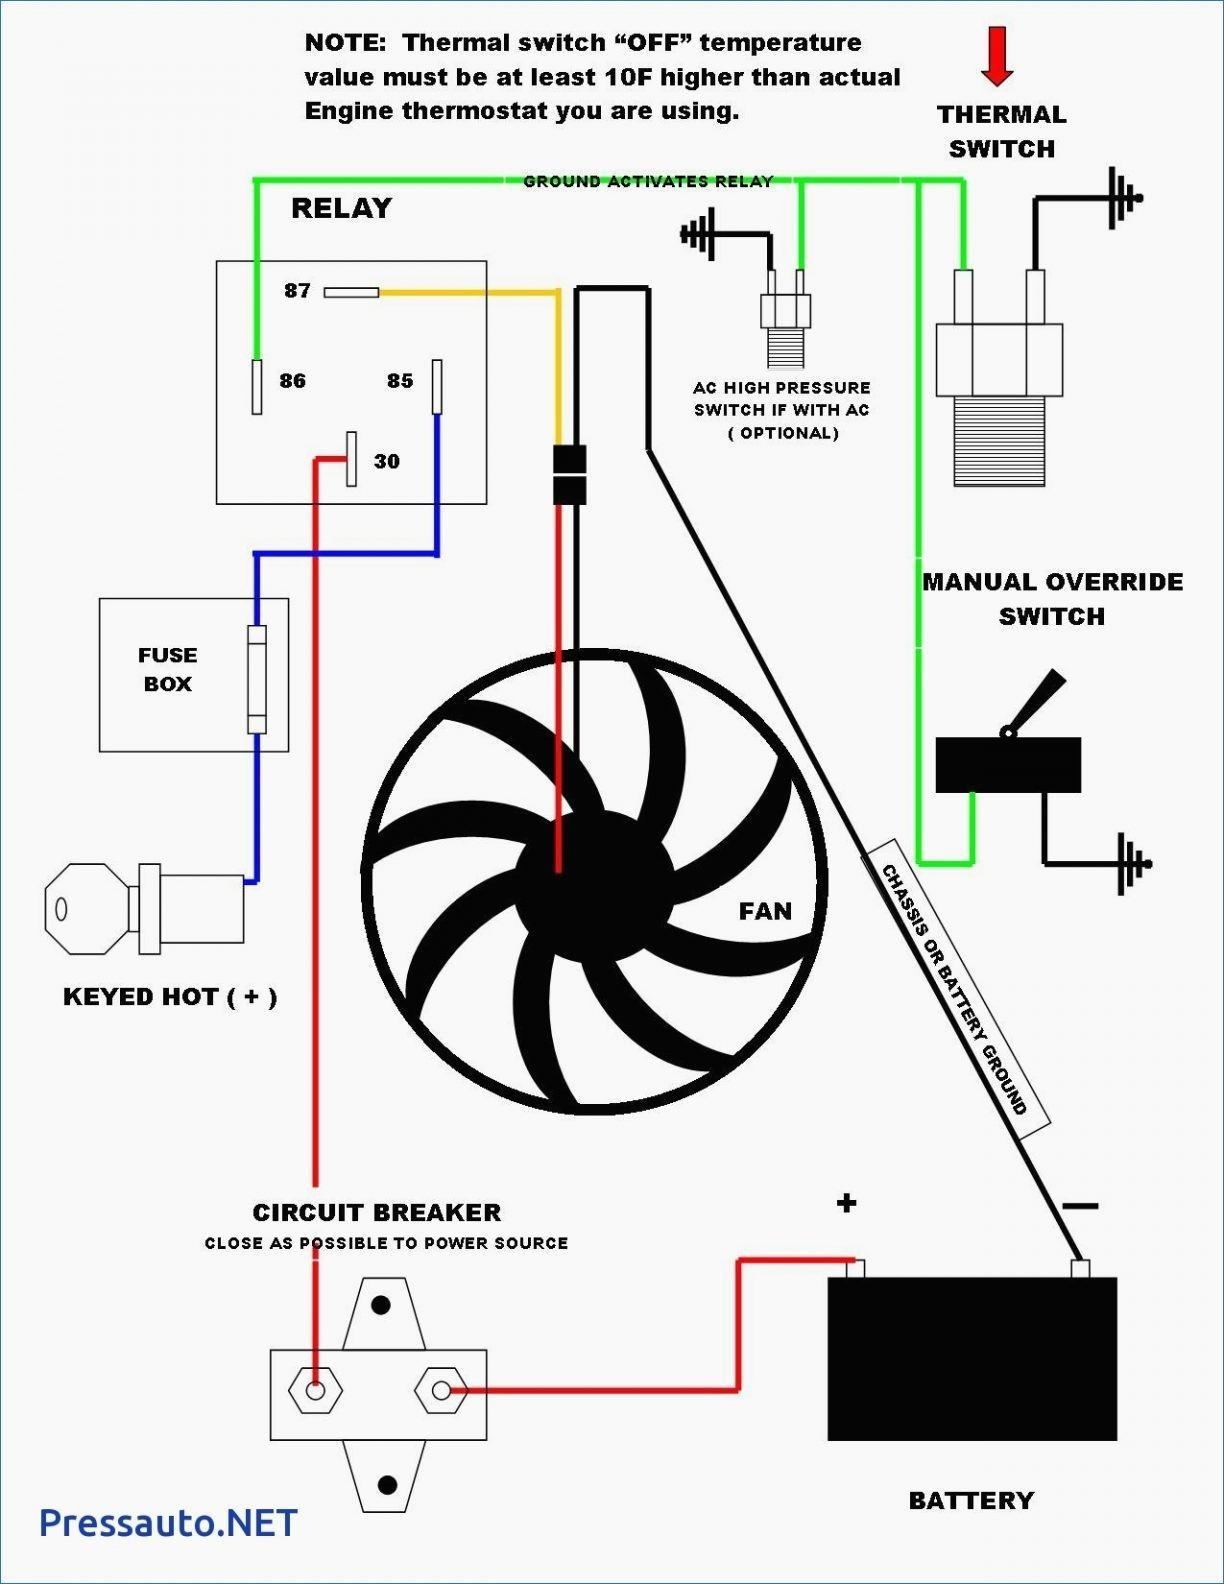 Groovy Gooseneck Trailer Wiring Diagram On Wiring Diagram For Pj Gooseneck Wiring Cloud Hisonuggs Outletorg